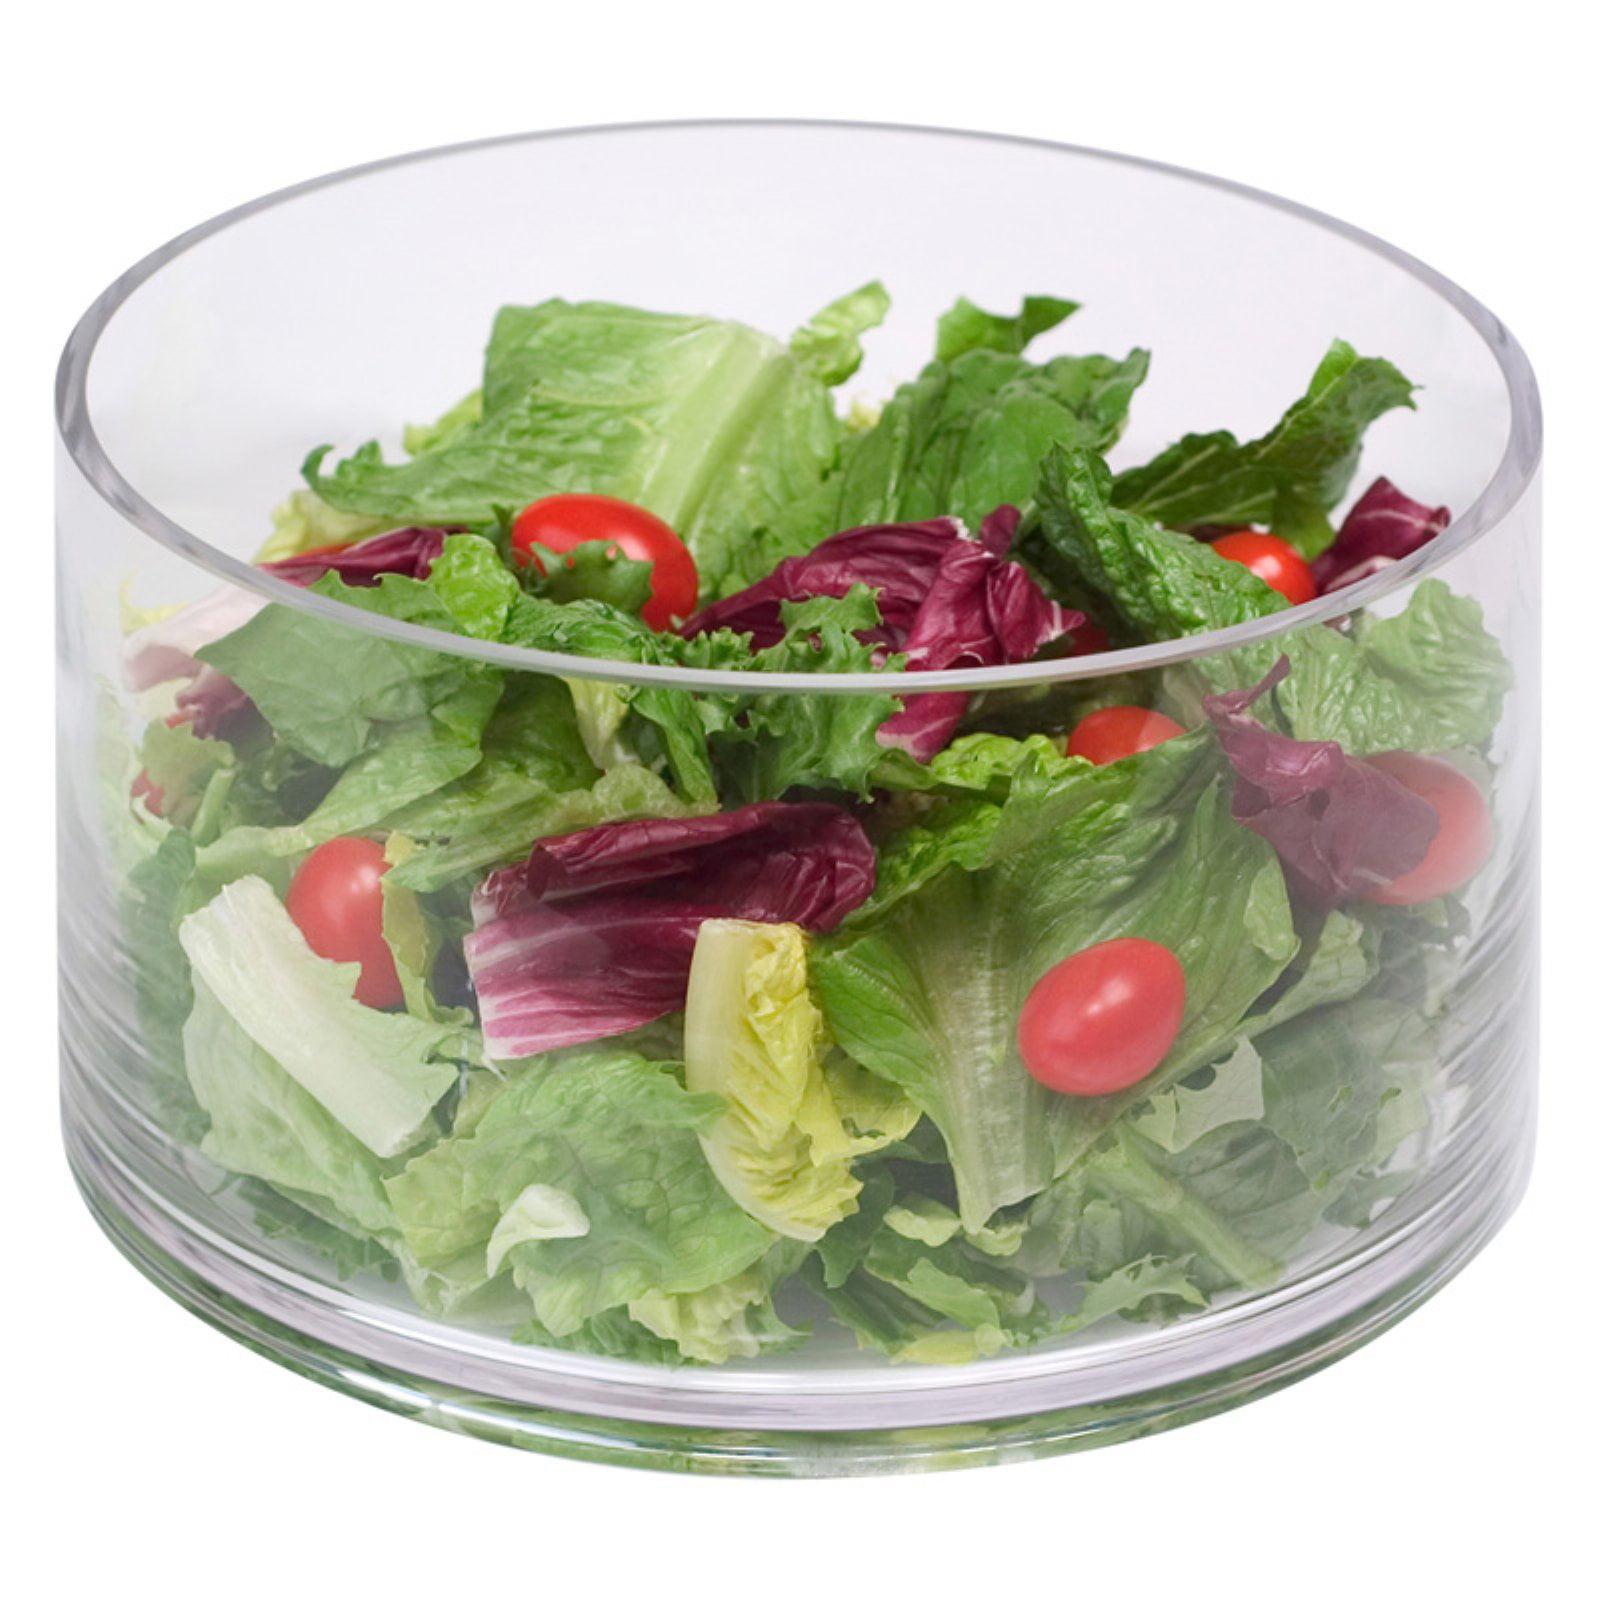 Artland Simplicity Cylinder Salad Bowl by Artland